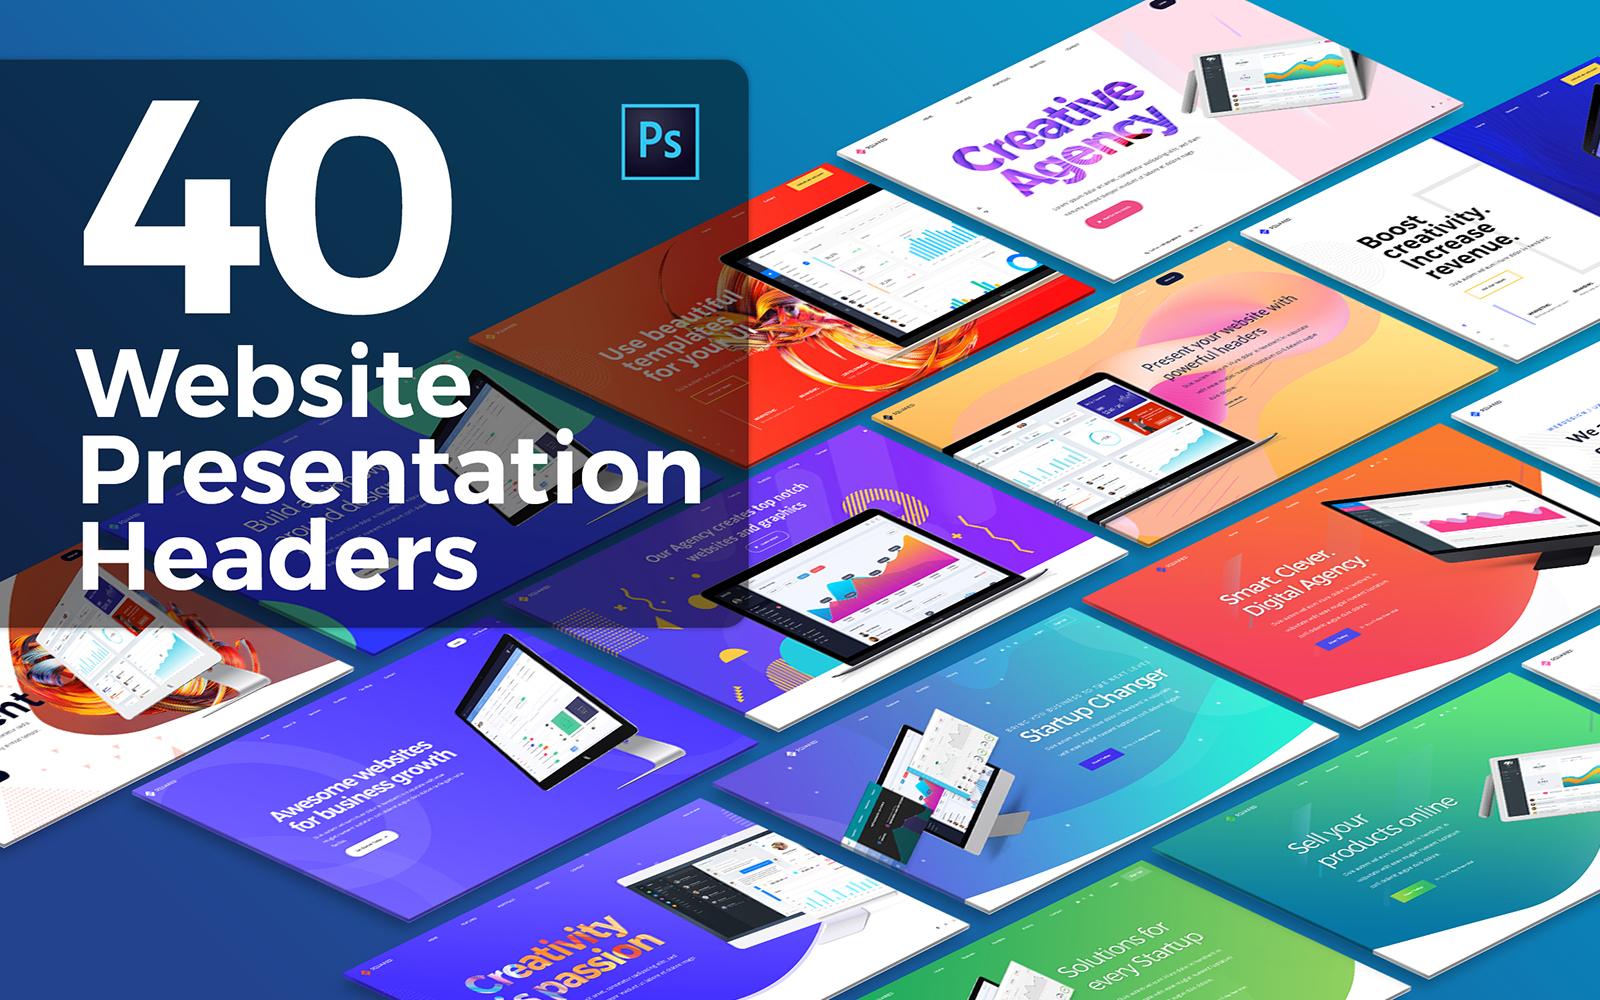 40 Website Presentation Headers №122659